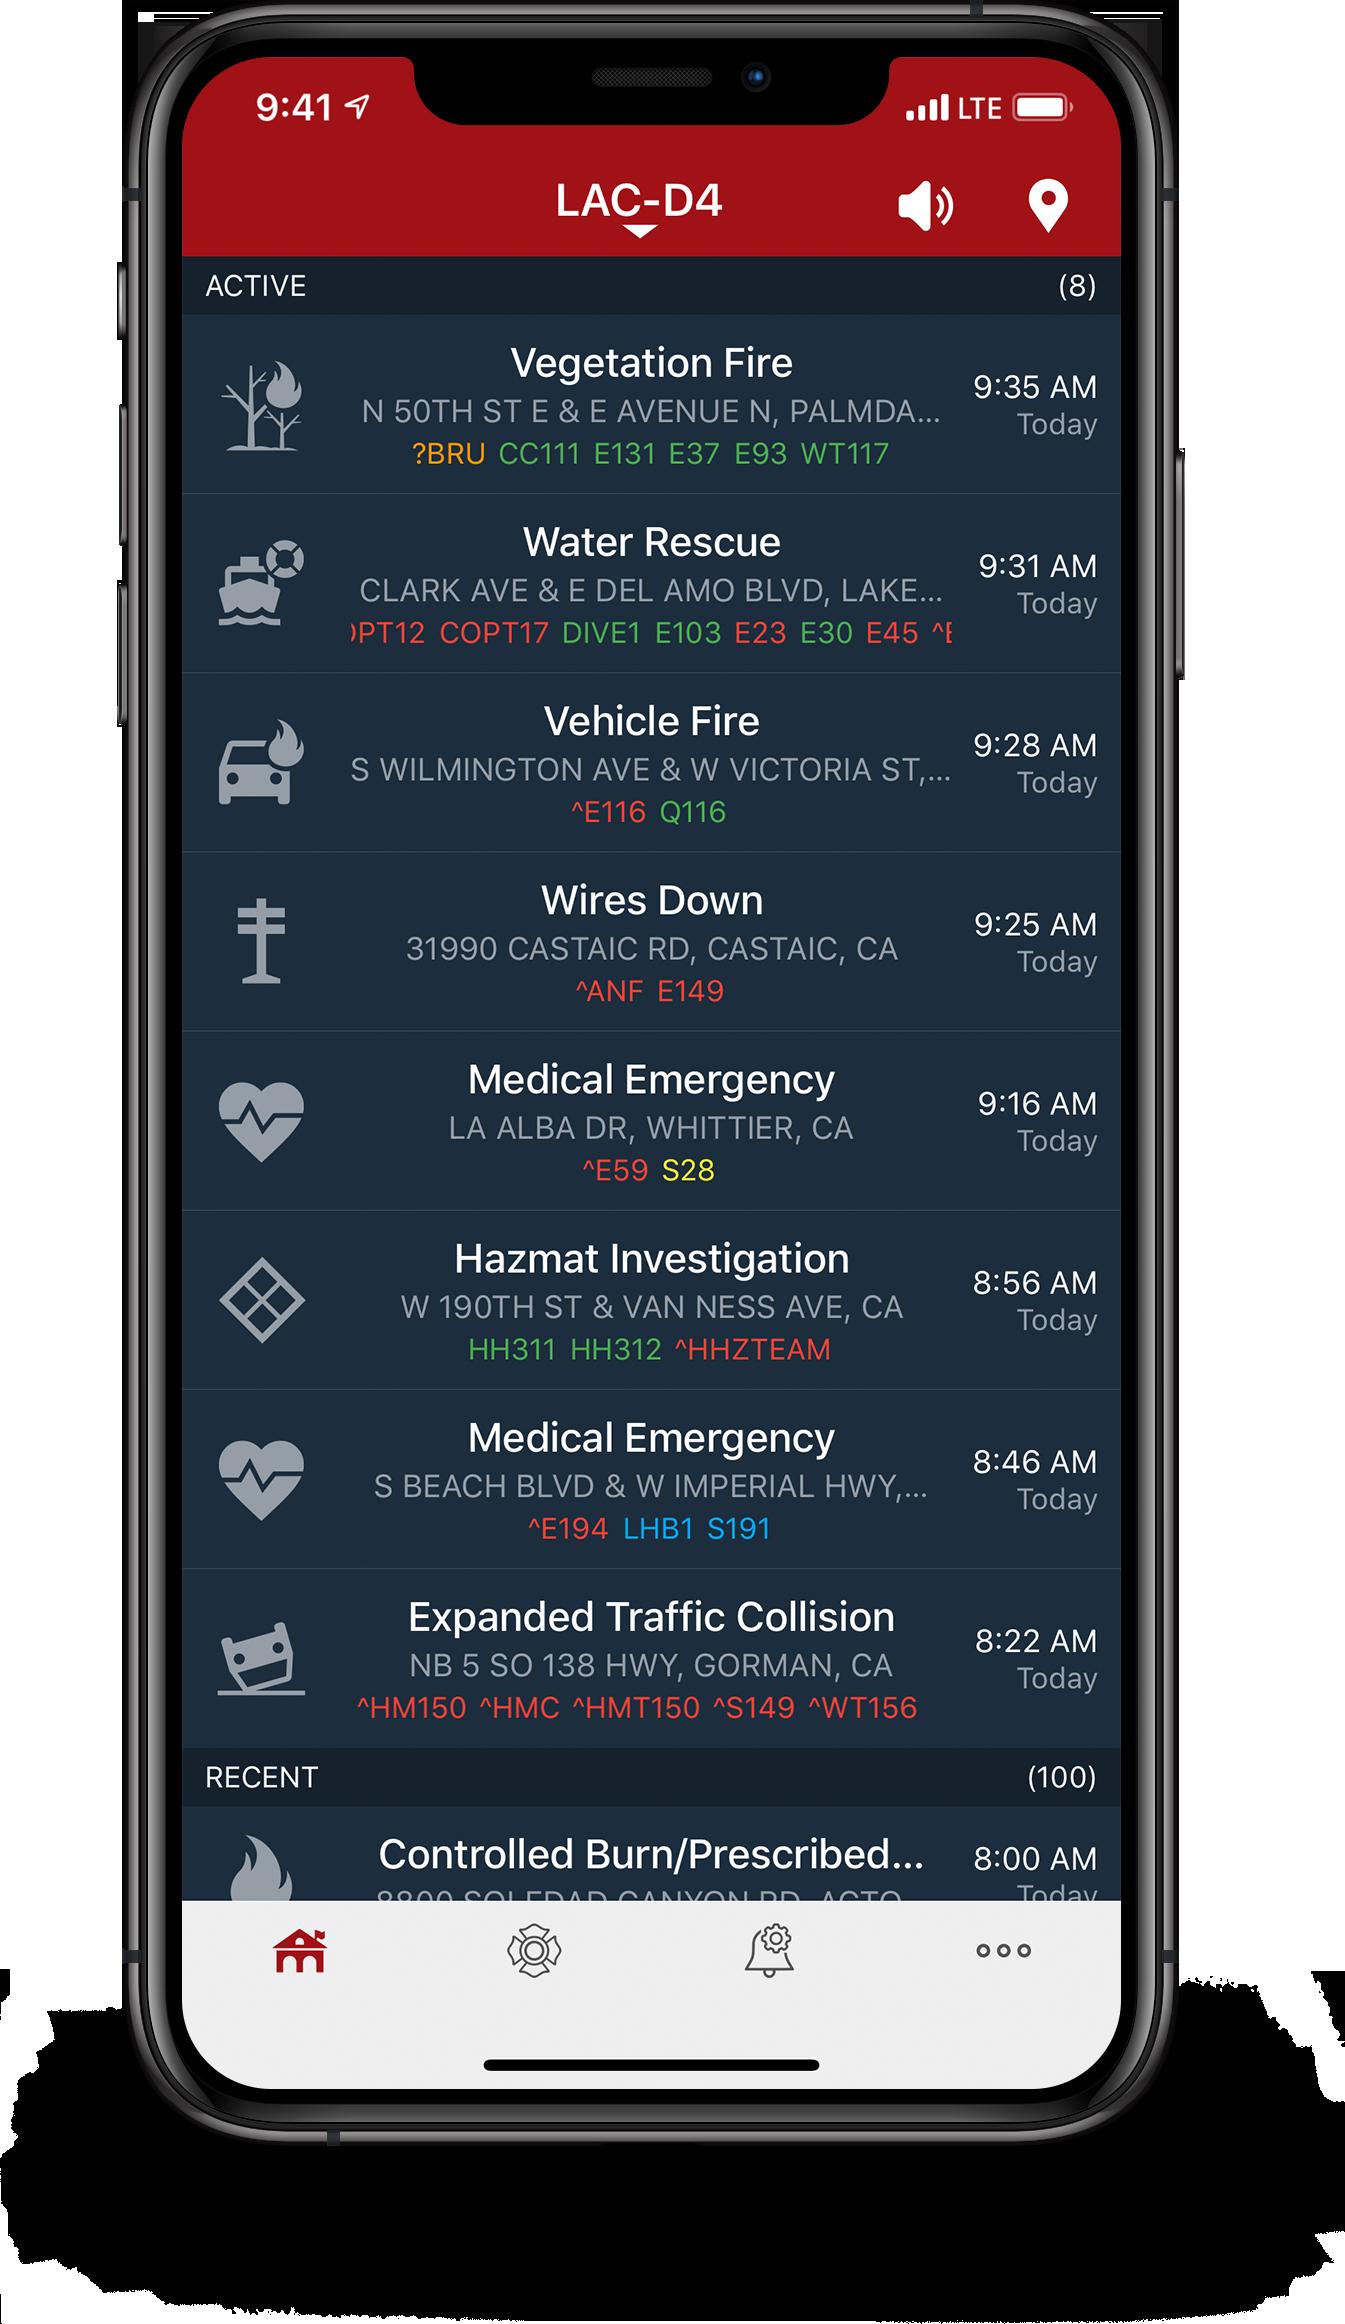 PulsePoint Respond Incident List screen.